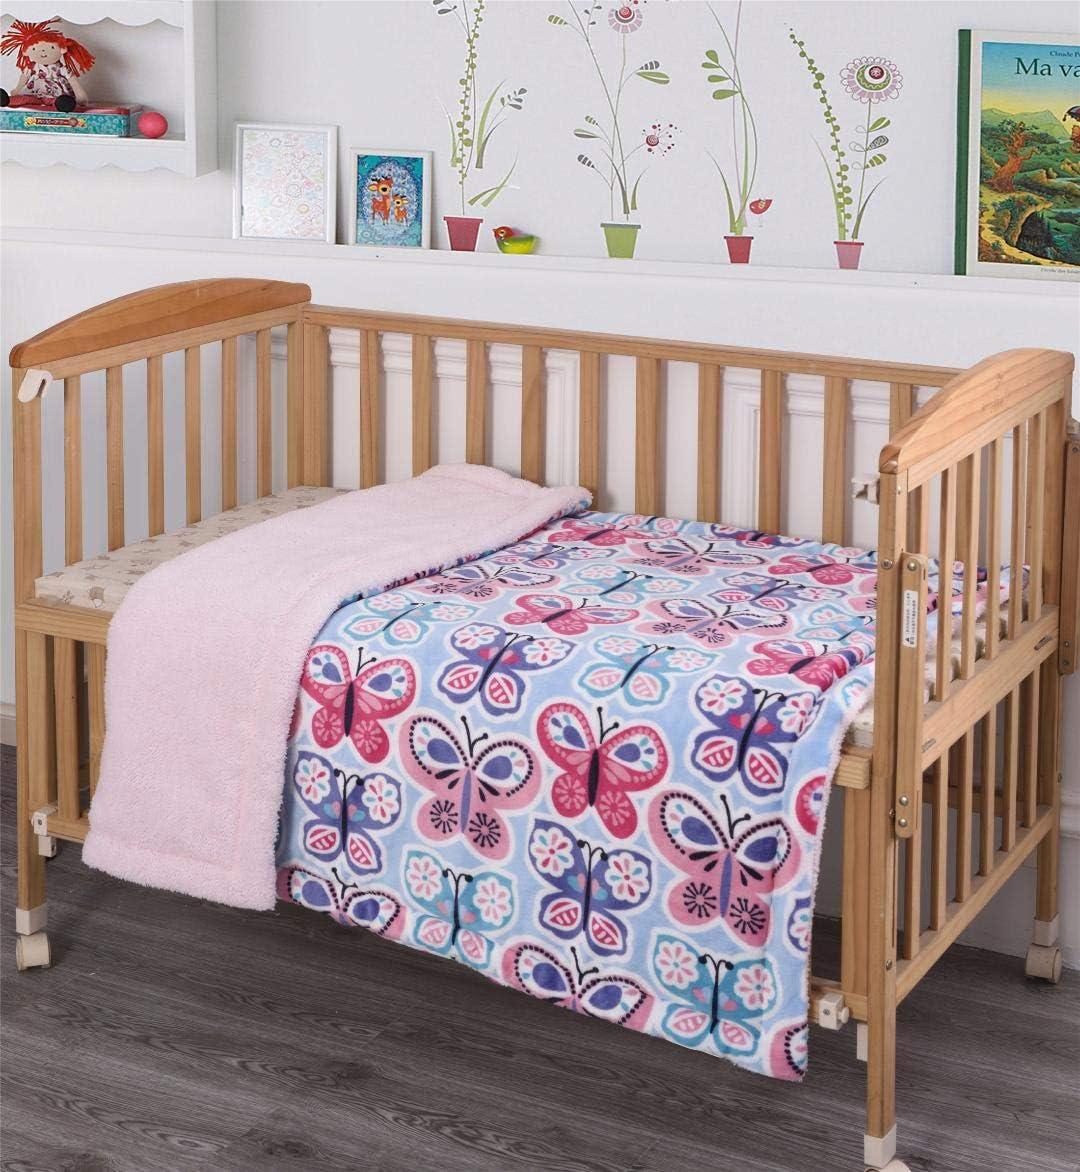 MB Collection Kids Soft & Warm Butterflies Blue Pink White Purple Design Sherpa Baby Toddler Girls Blanket Printed Borrego Stroller or Baby Crib or Toddler Bed Blanket Plush 40X50# Blue Butterfly